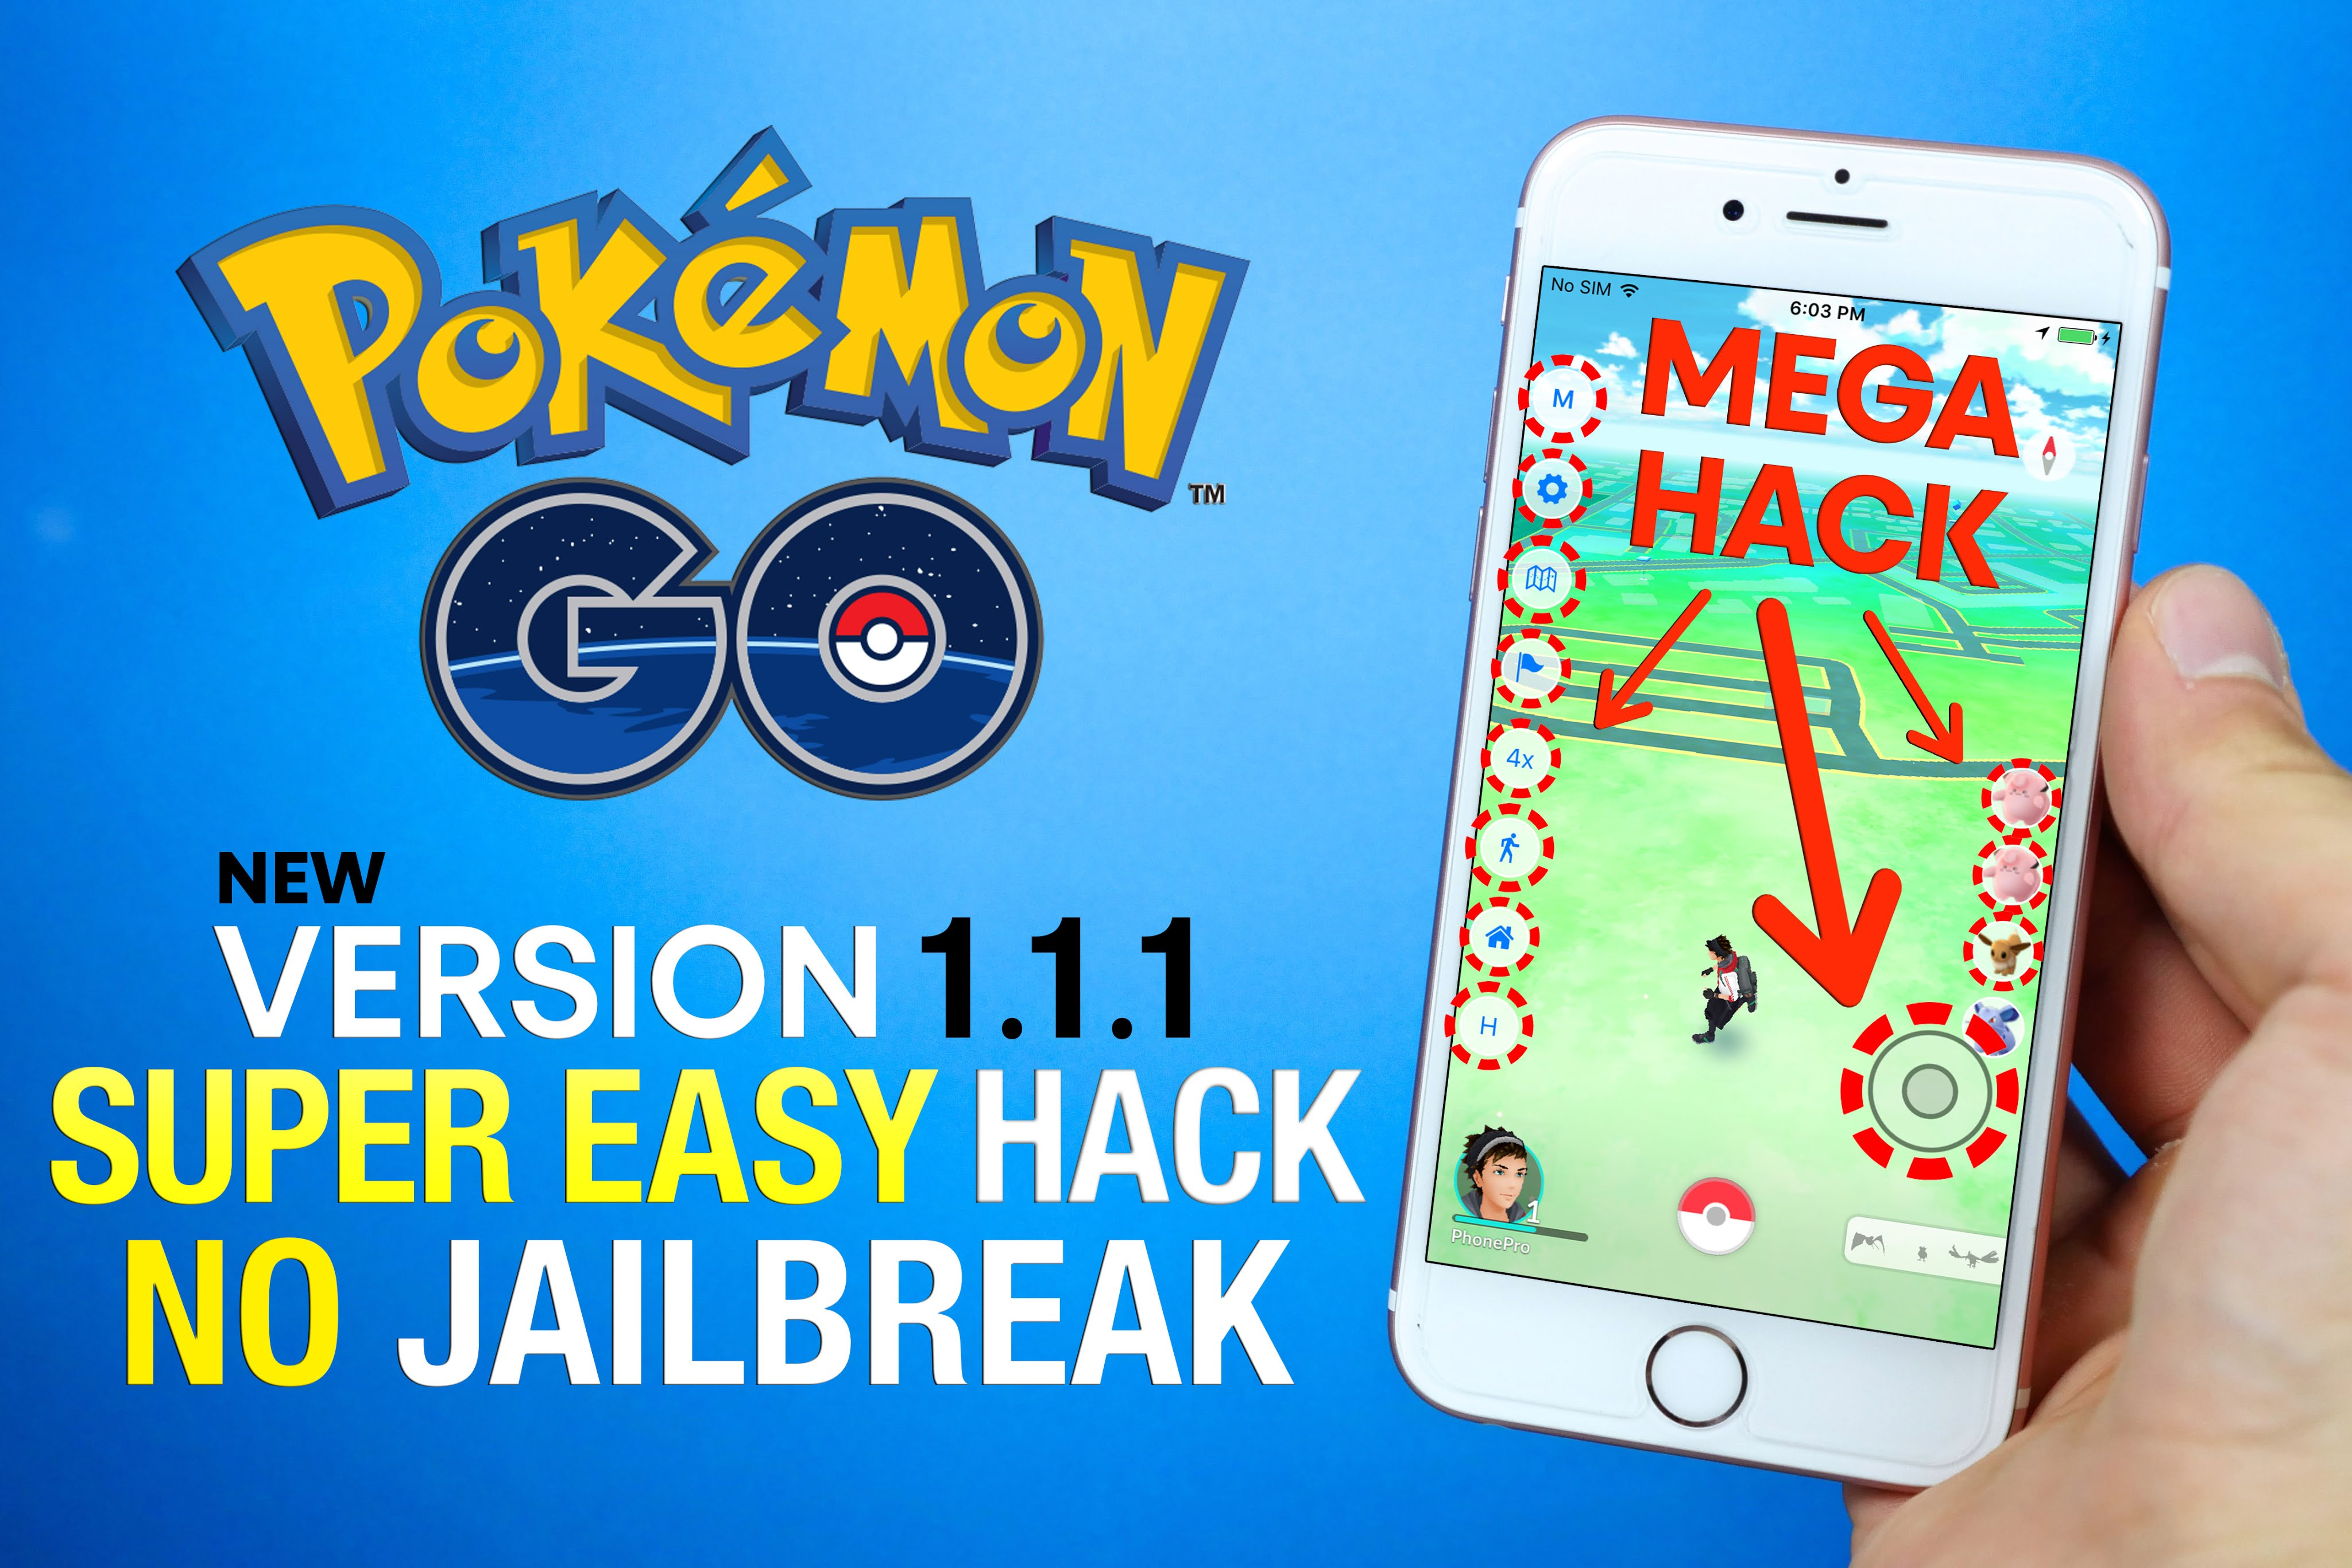 Pokémon GO v1 87 3 (PokeGo++) [Tap to walk anywhere] [Direct Install